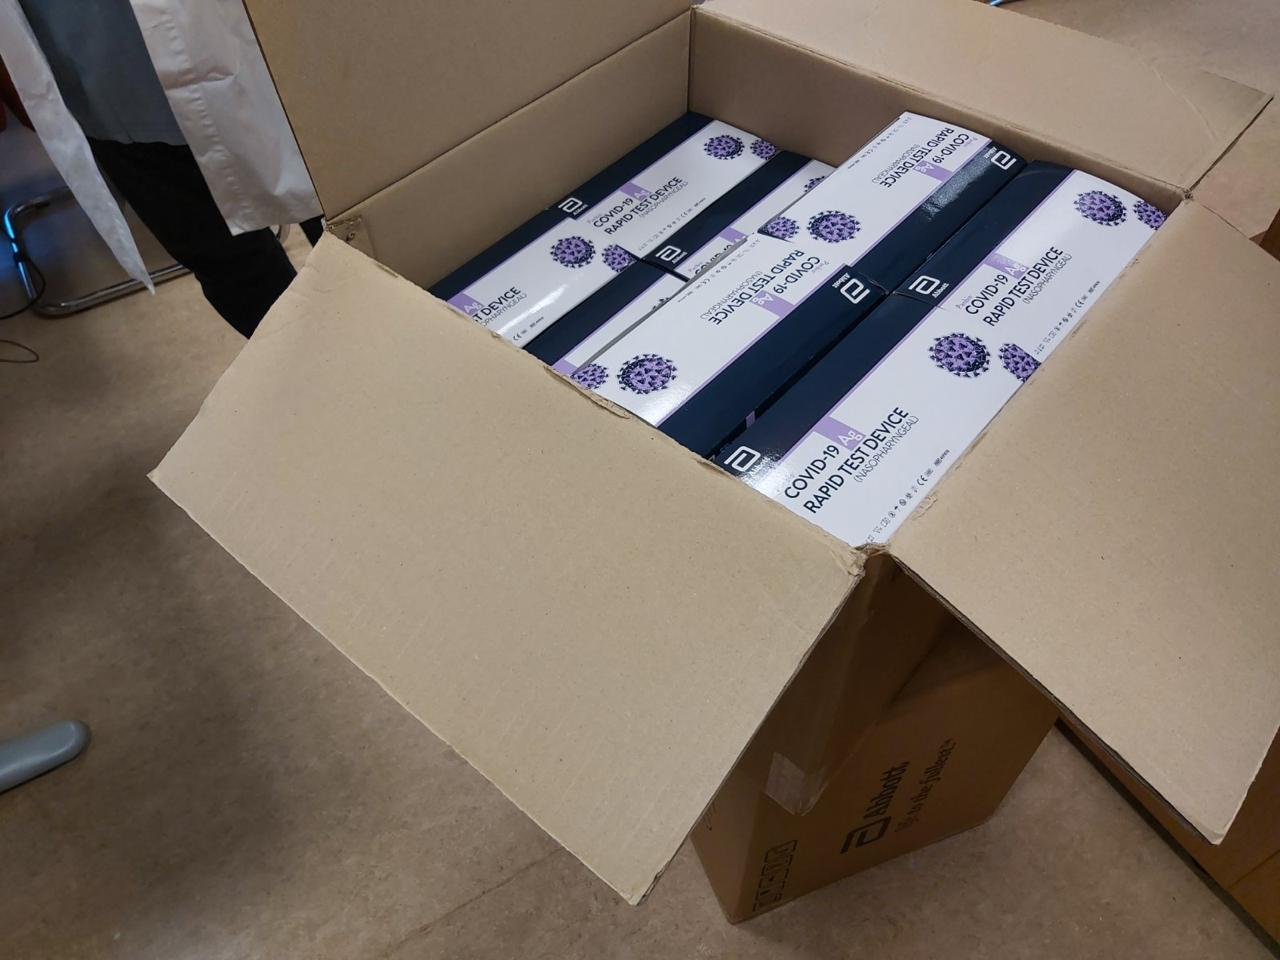 1.500 rapid tests στάλθηκαν χθες βράδυ στο ΠΓΝ ΑΧΕΠΑ